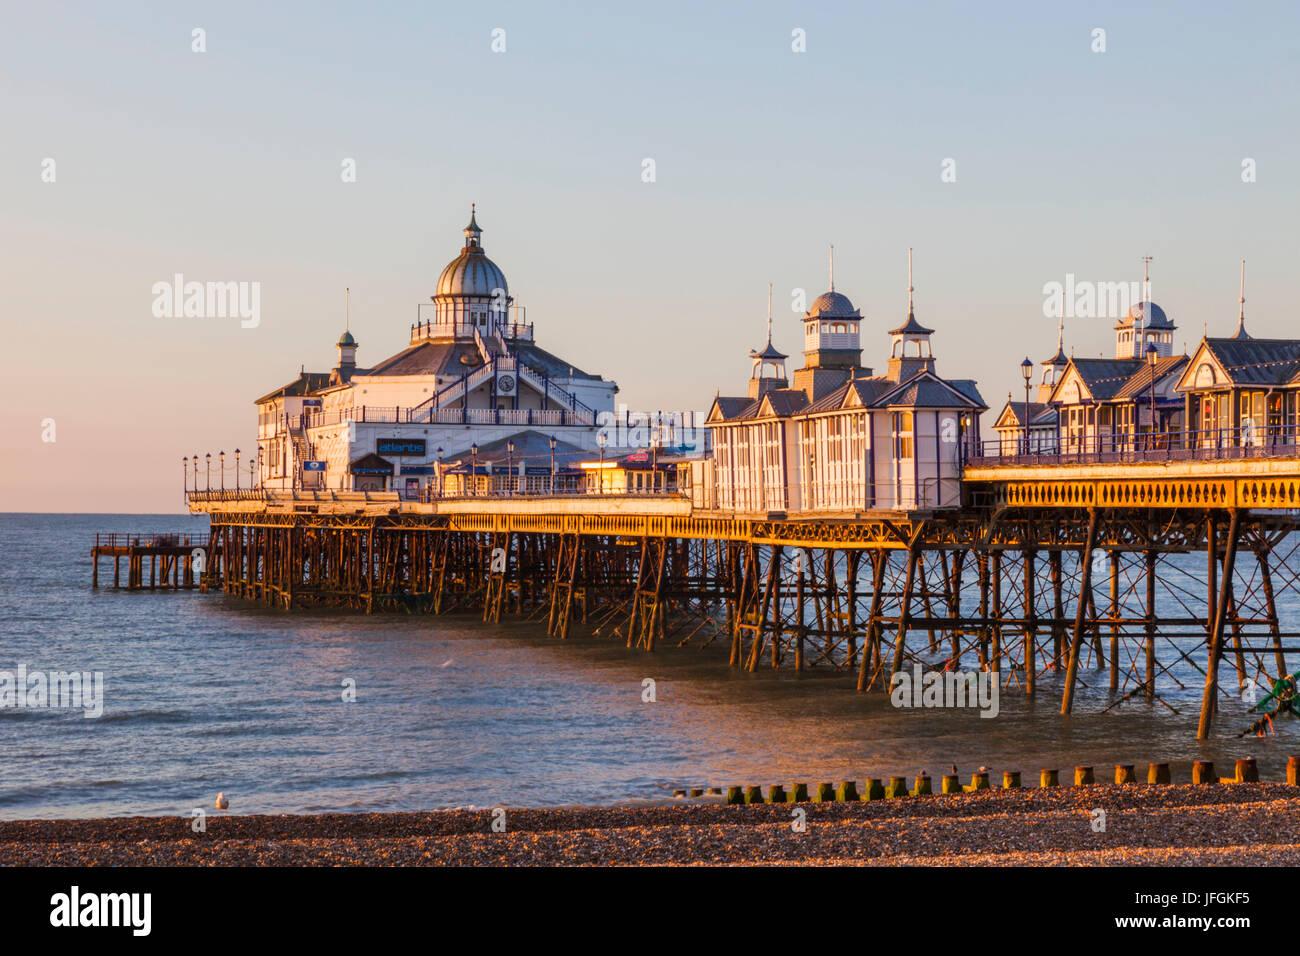 England, East Sussex, Eastbourne, Eastbourne Pier - Stock Image